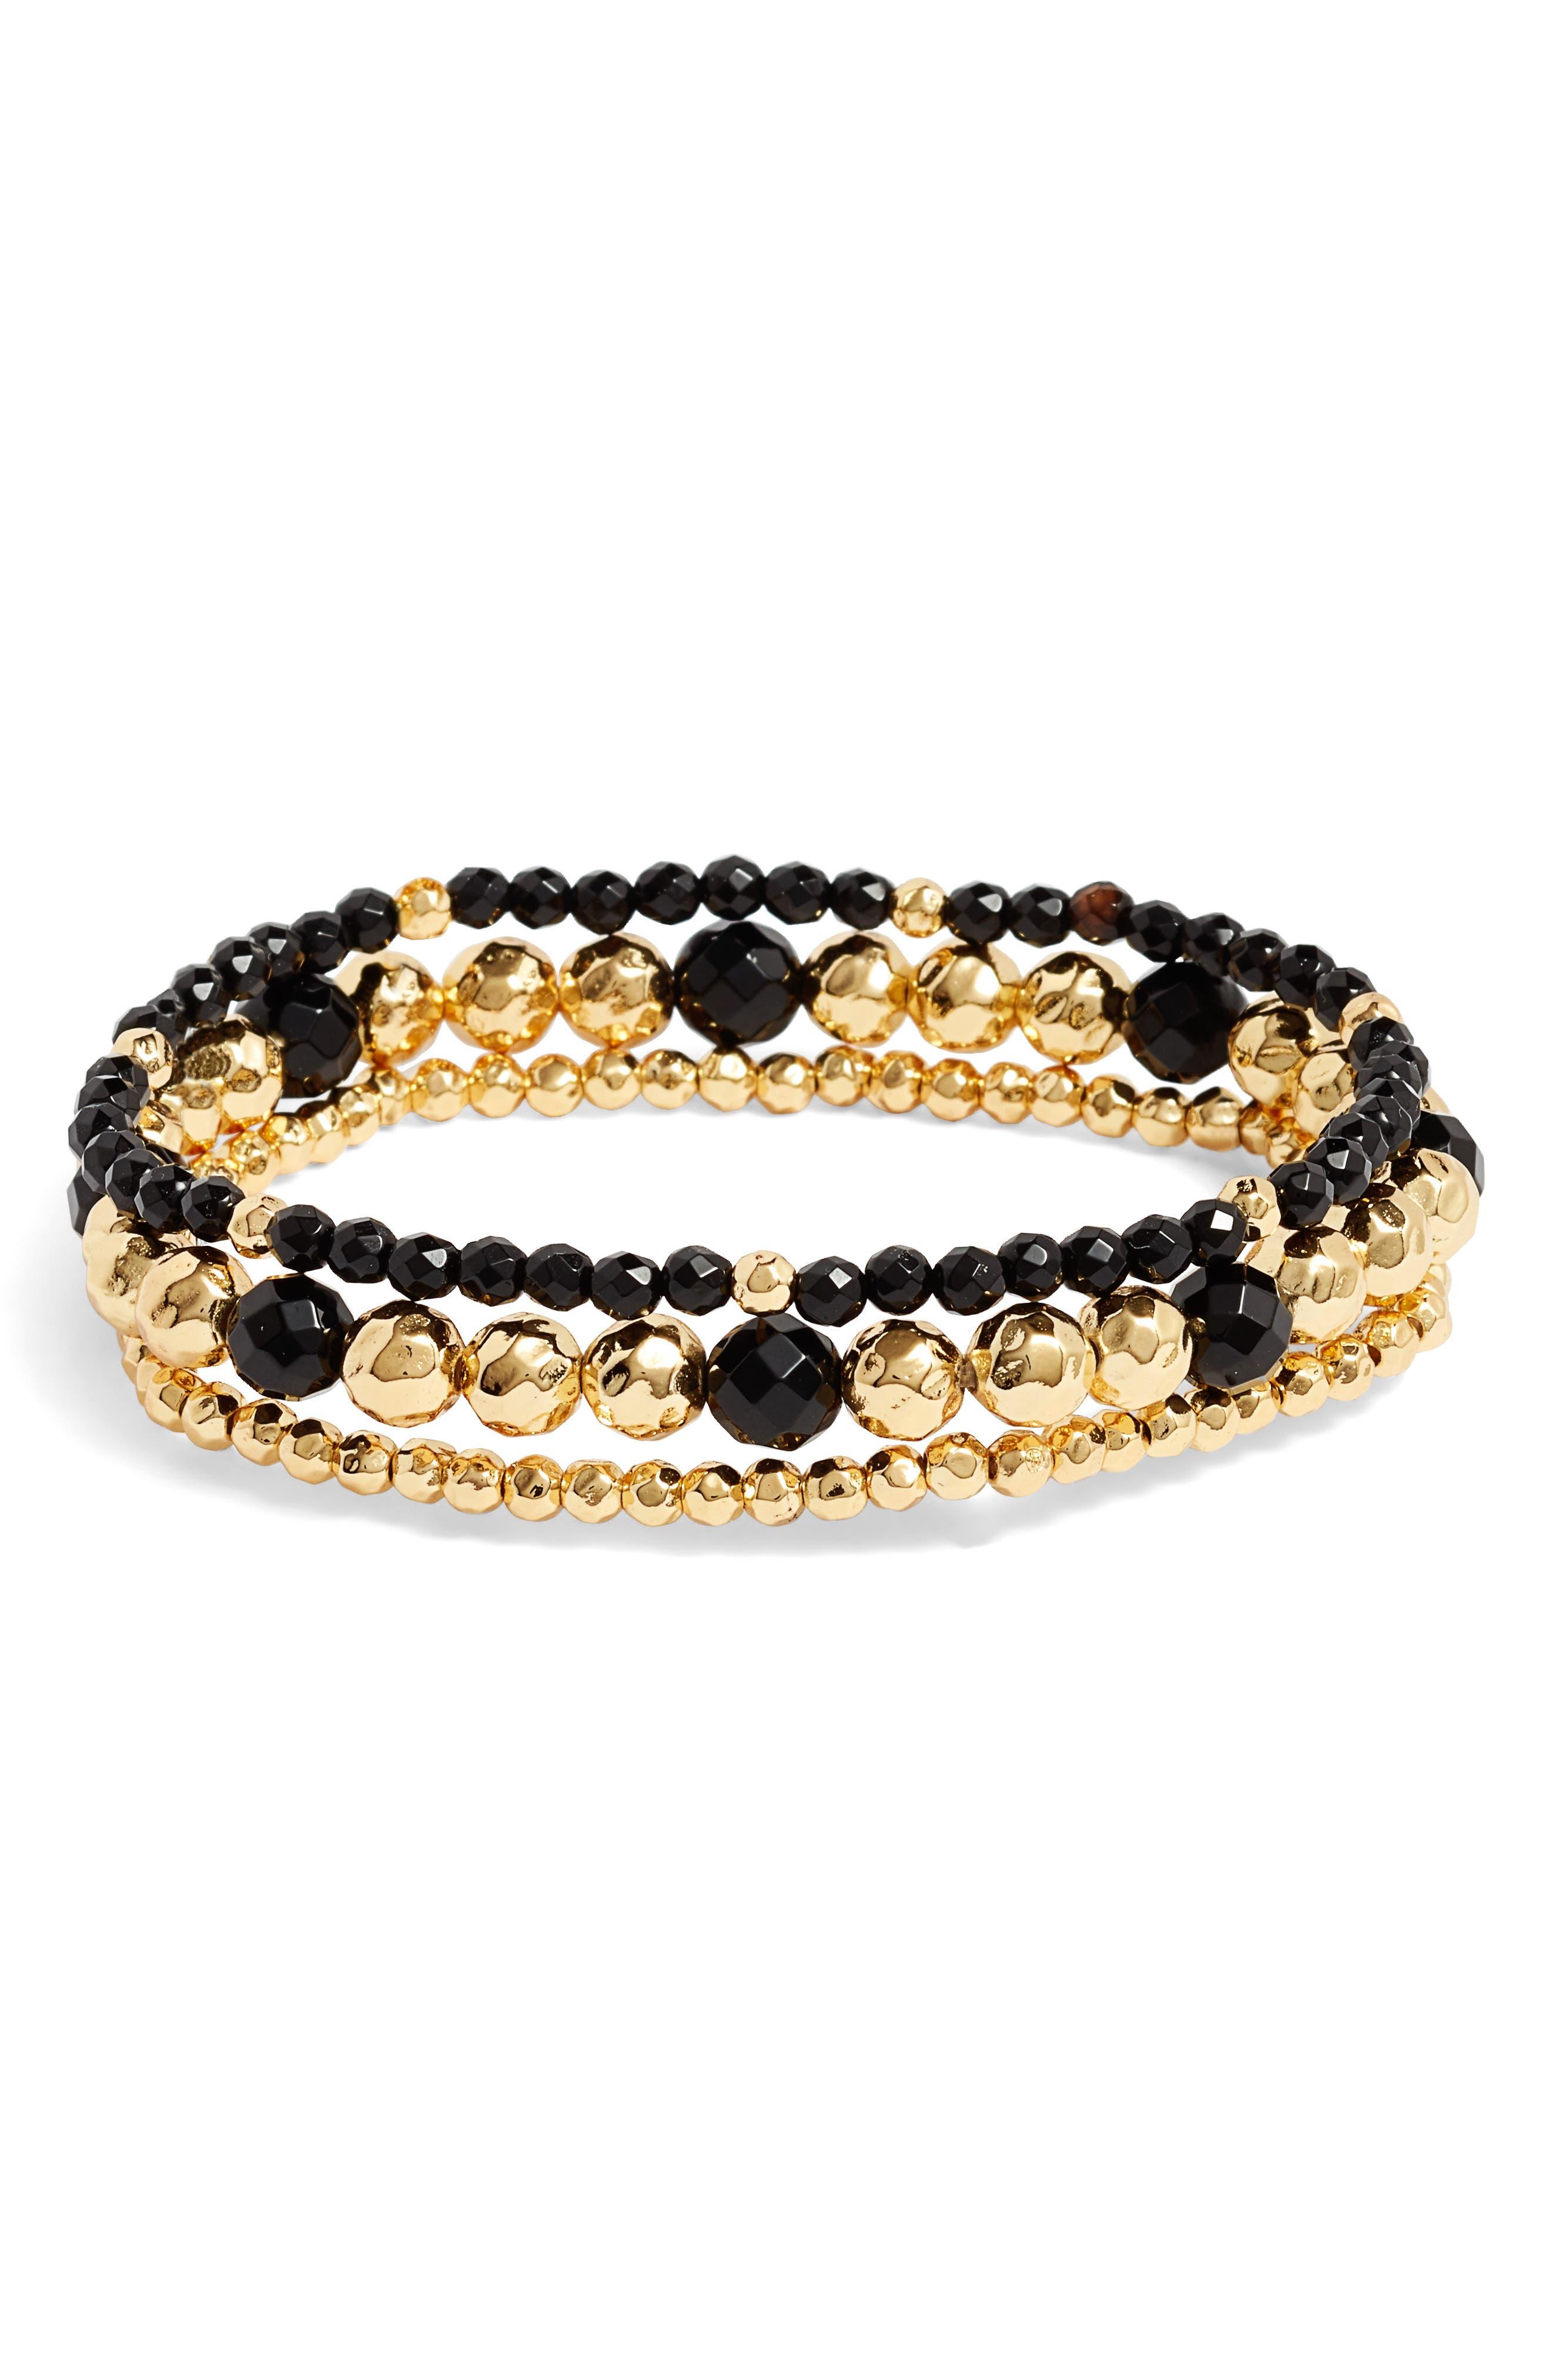 Gypset Set of 3 Bracelets,                         Main,                         color, 001